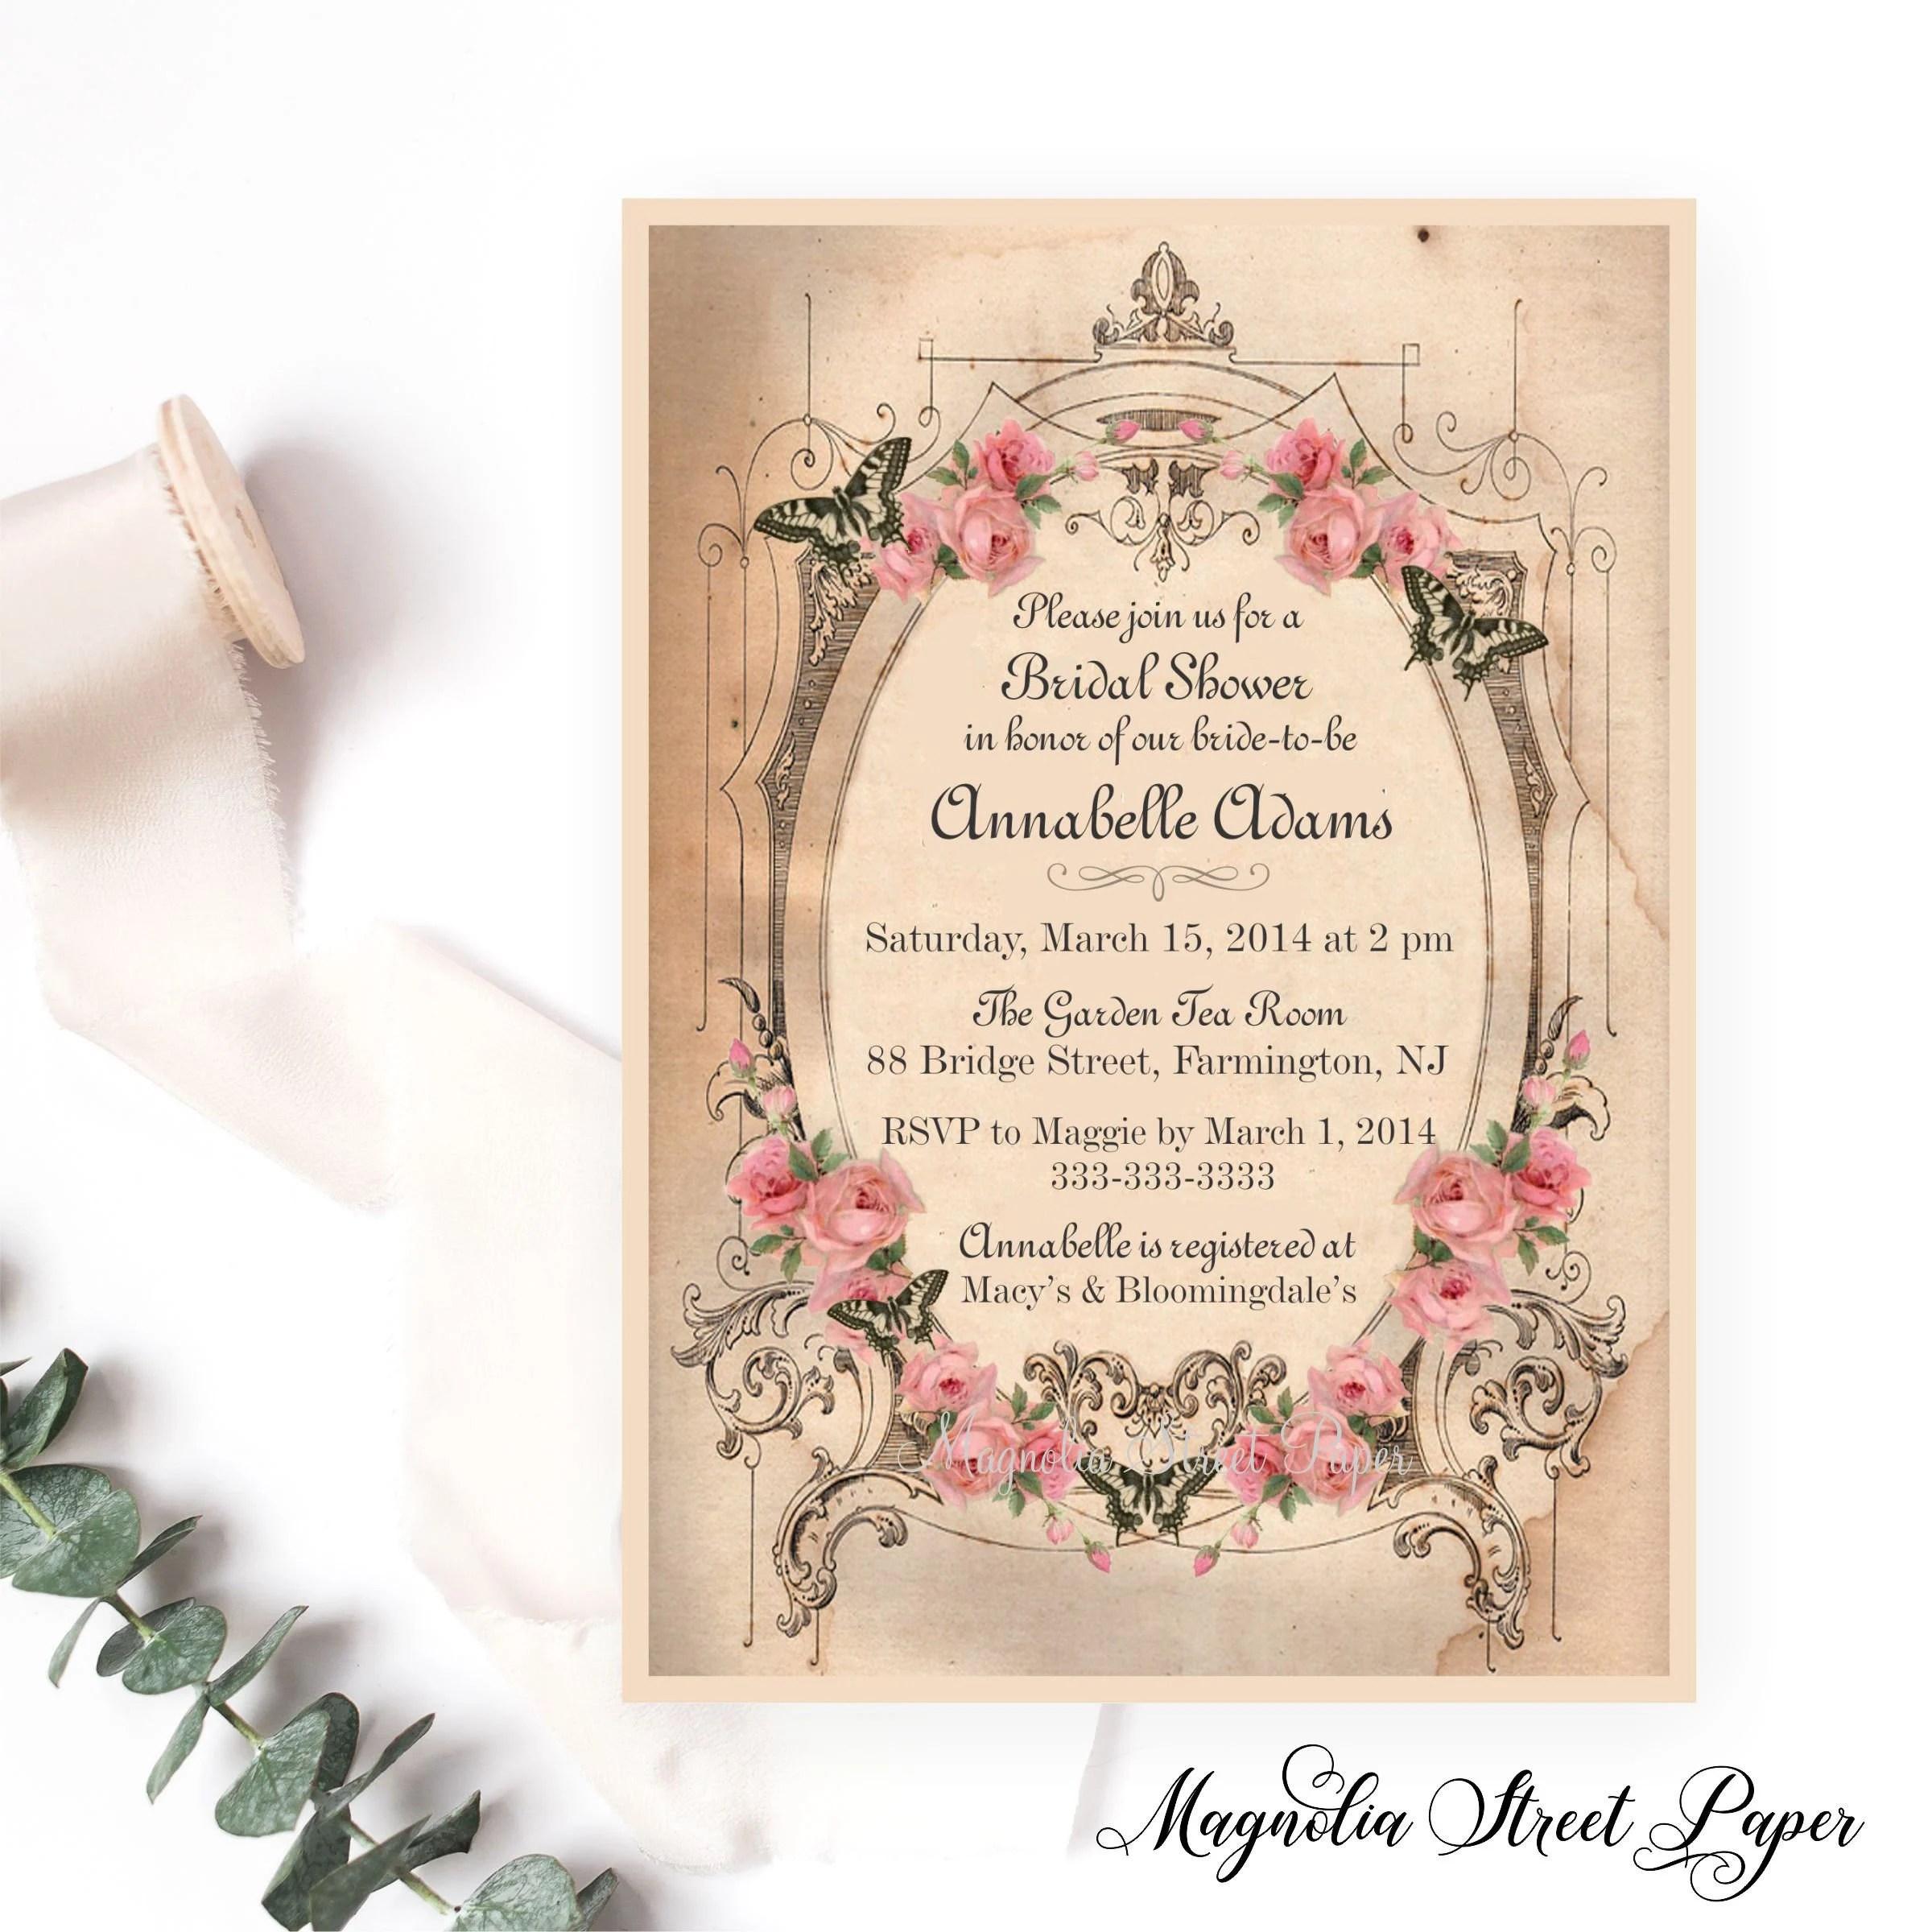 Vintage Shabby Chic Bridal Shower Invitation, Pink / Blush Roses and